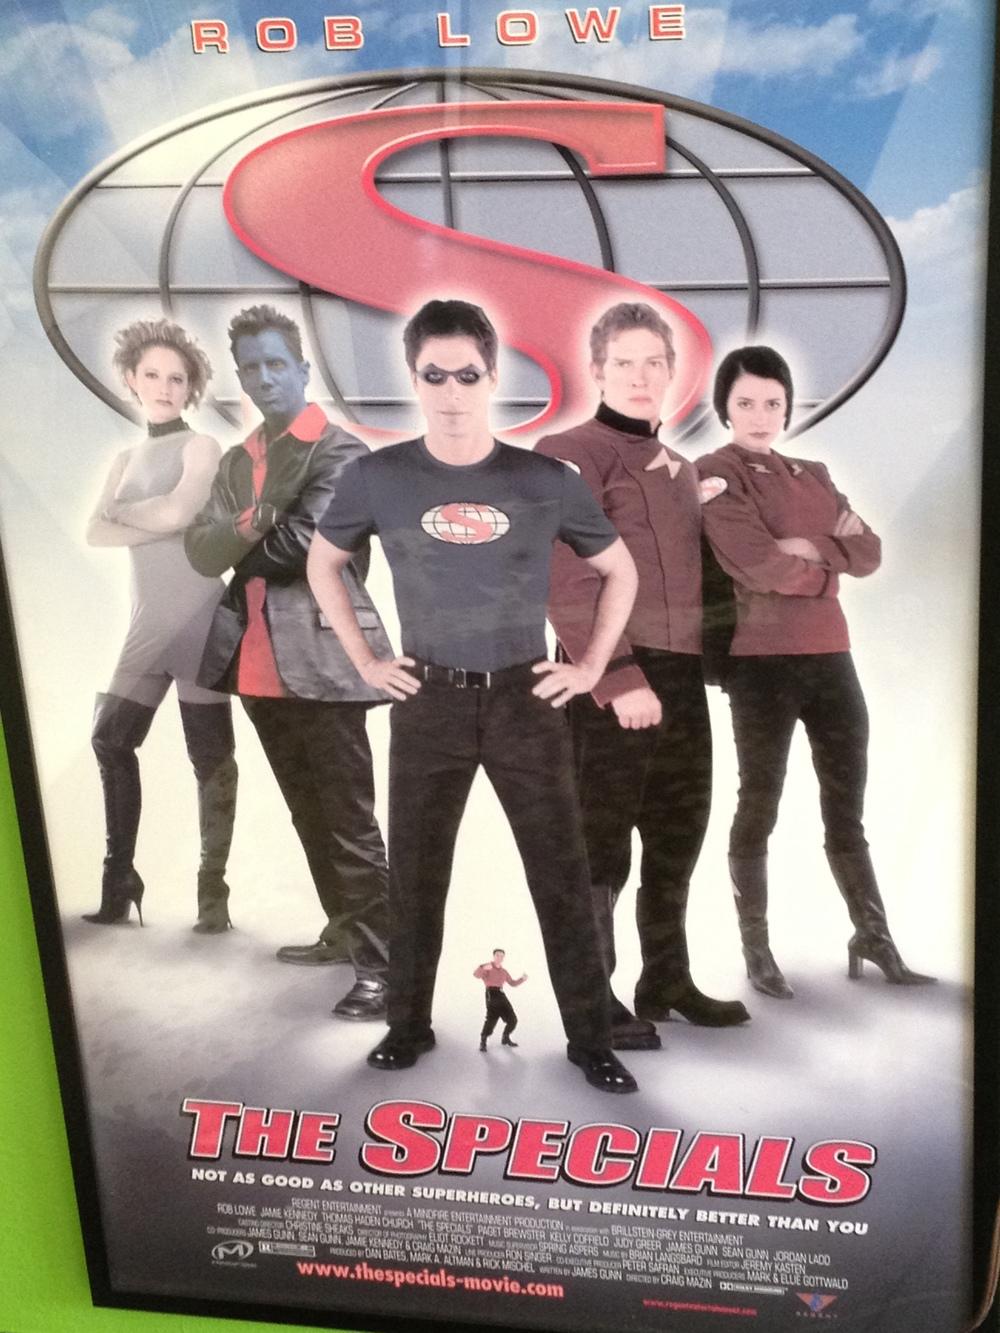 The Specials - read the tagline